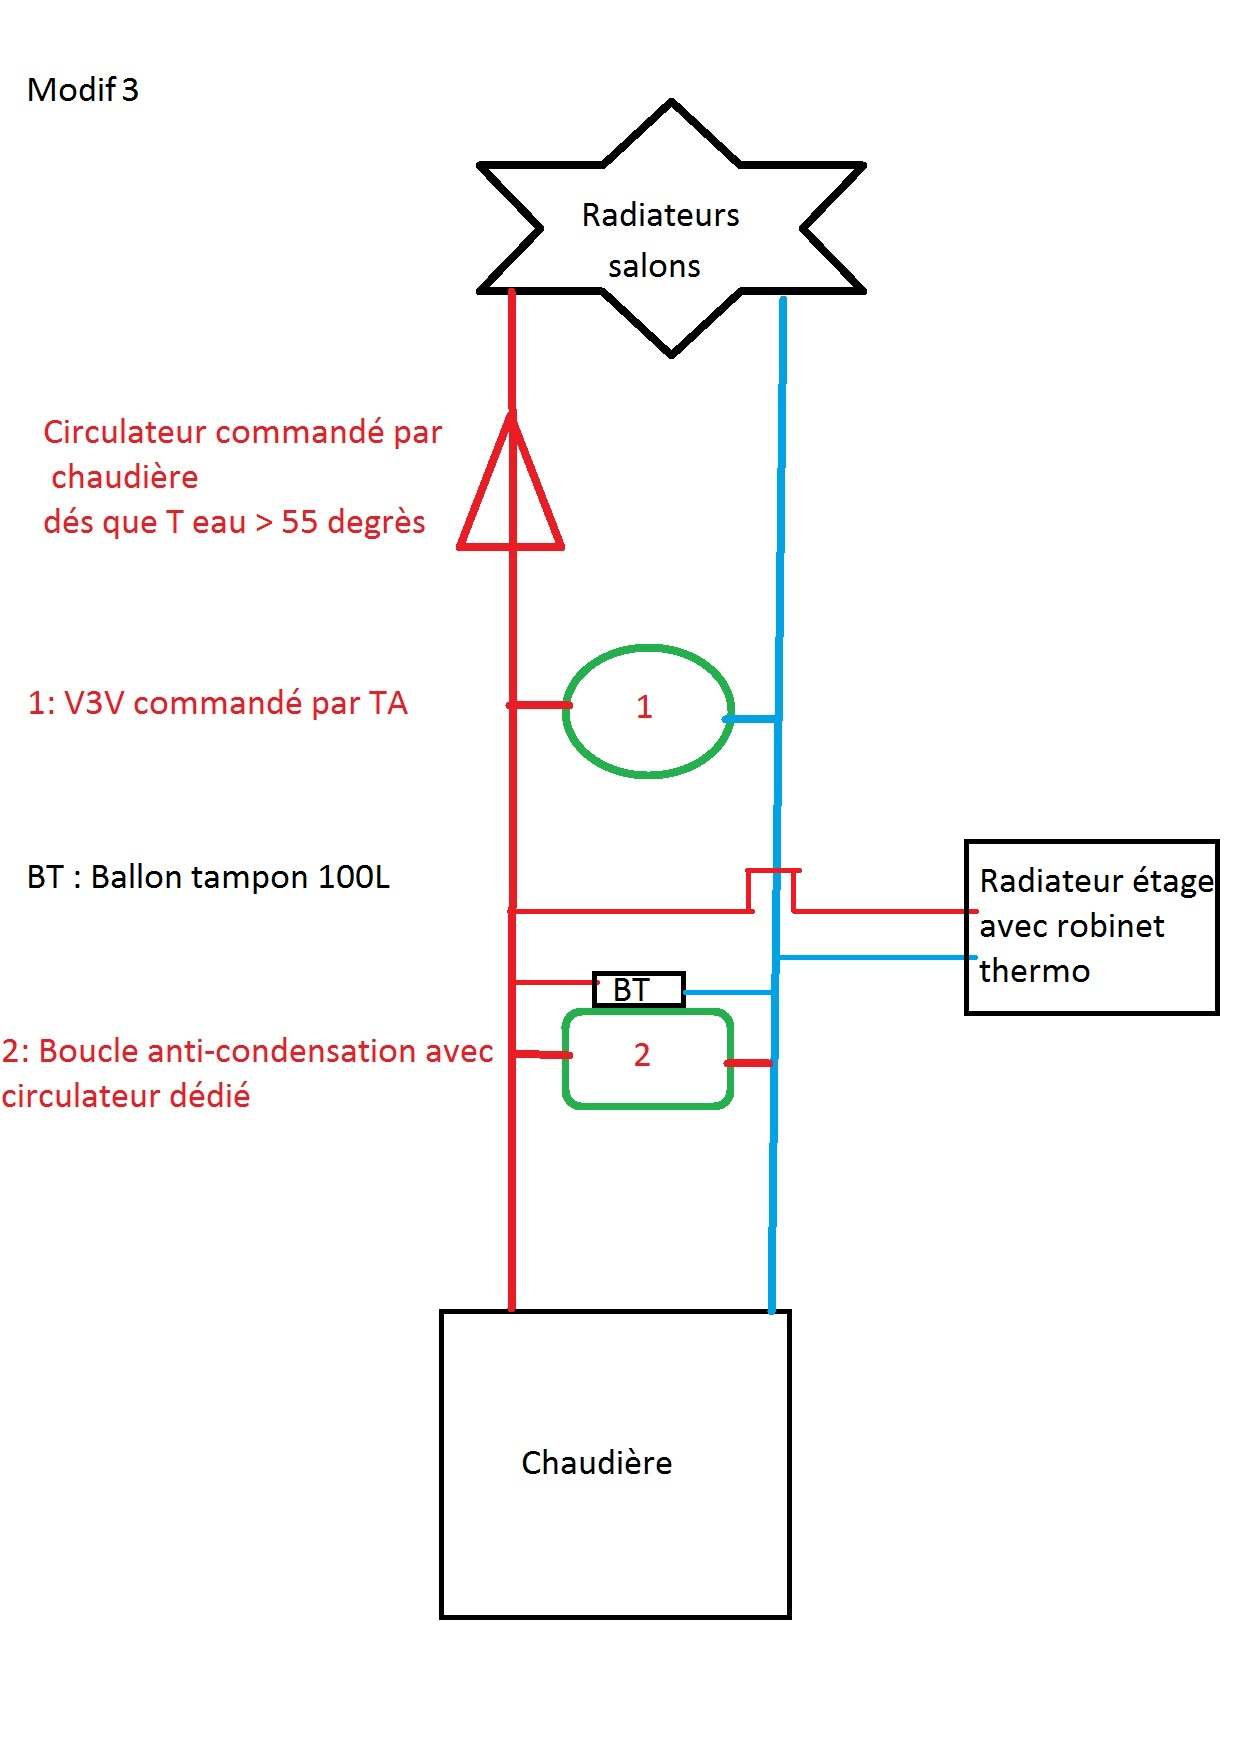 chauffage etage et BT.jpg, 181.81 kb, 1241 x 1754